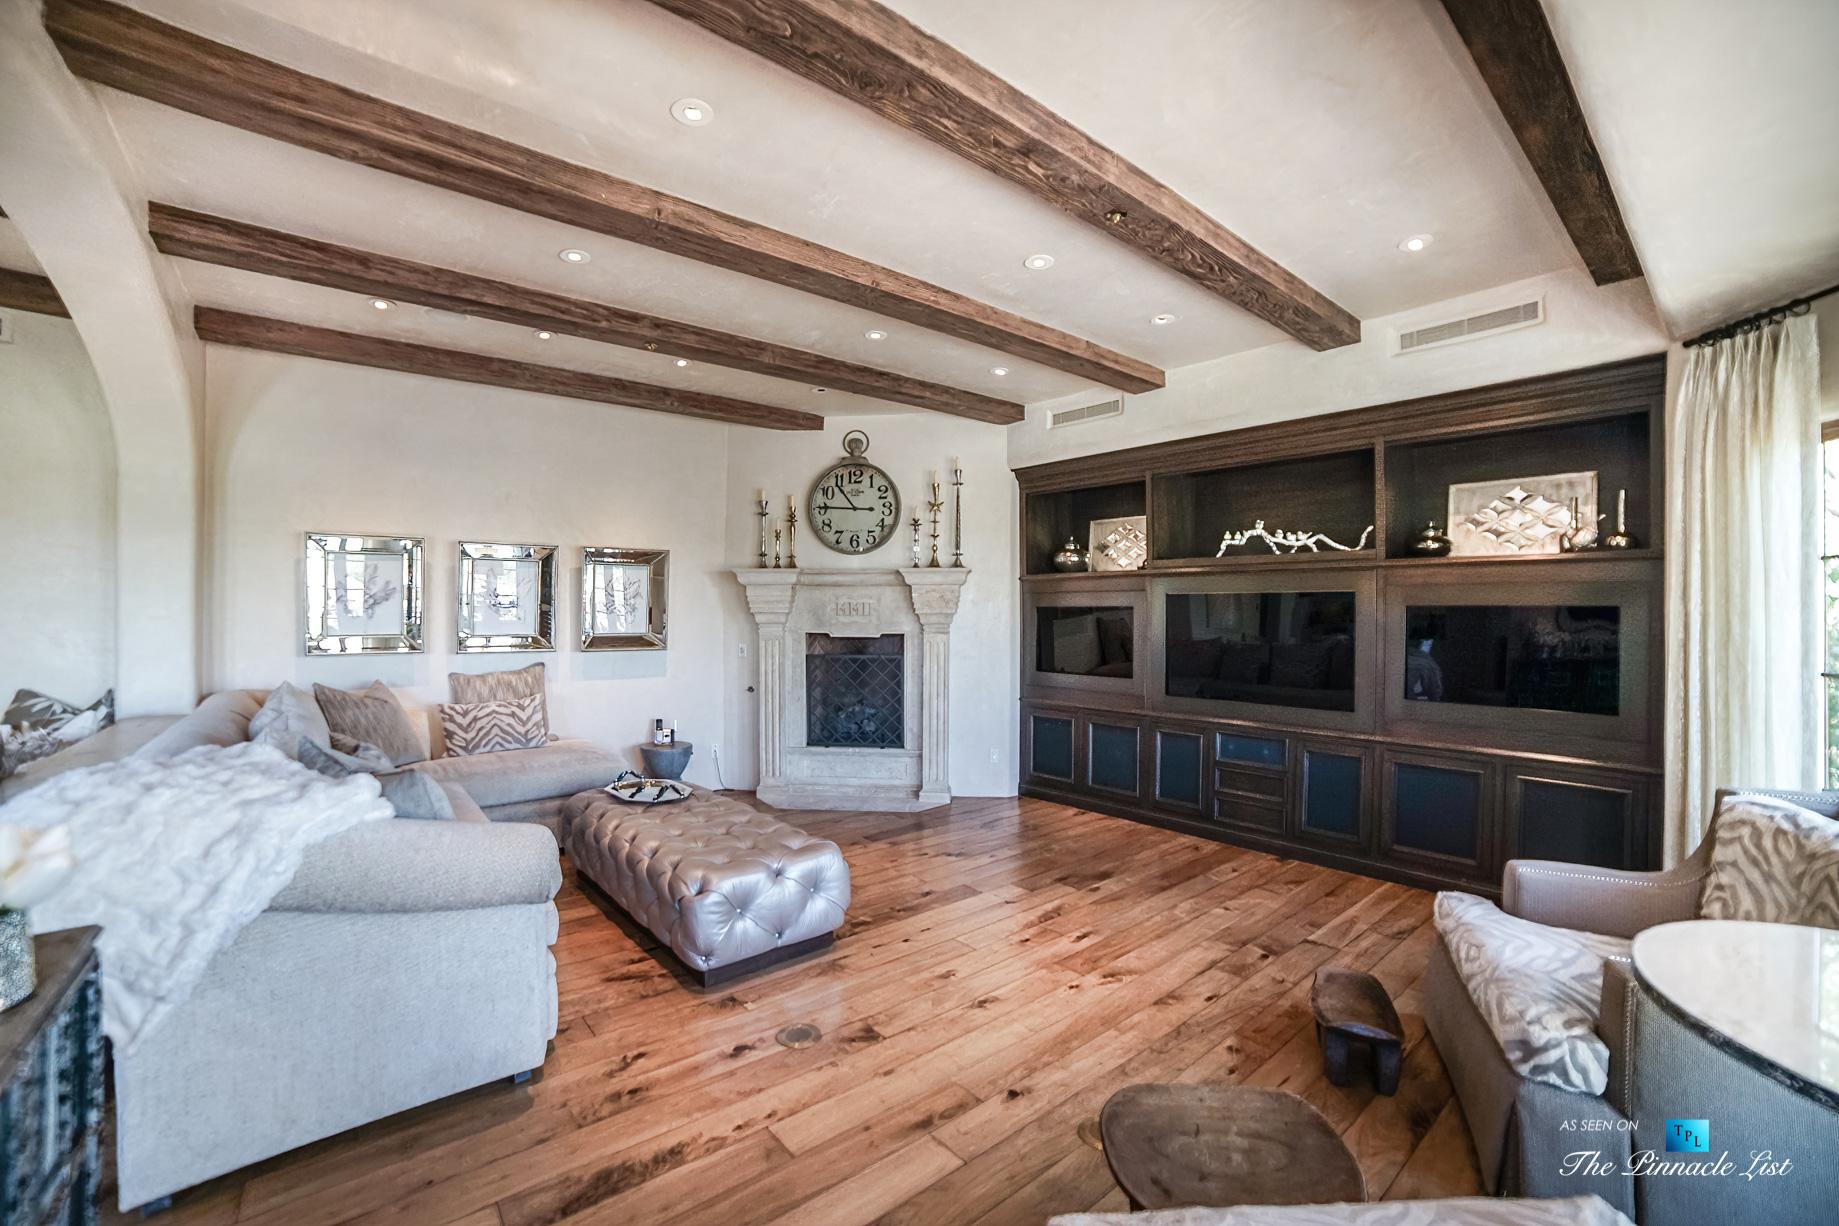 6539 N 31st Pl, Phoenix, AZ, USA - Family Room - Luxury Real Estate - Biltmore Mountain Estates - Spanish Colonial Home